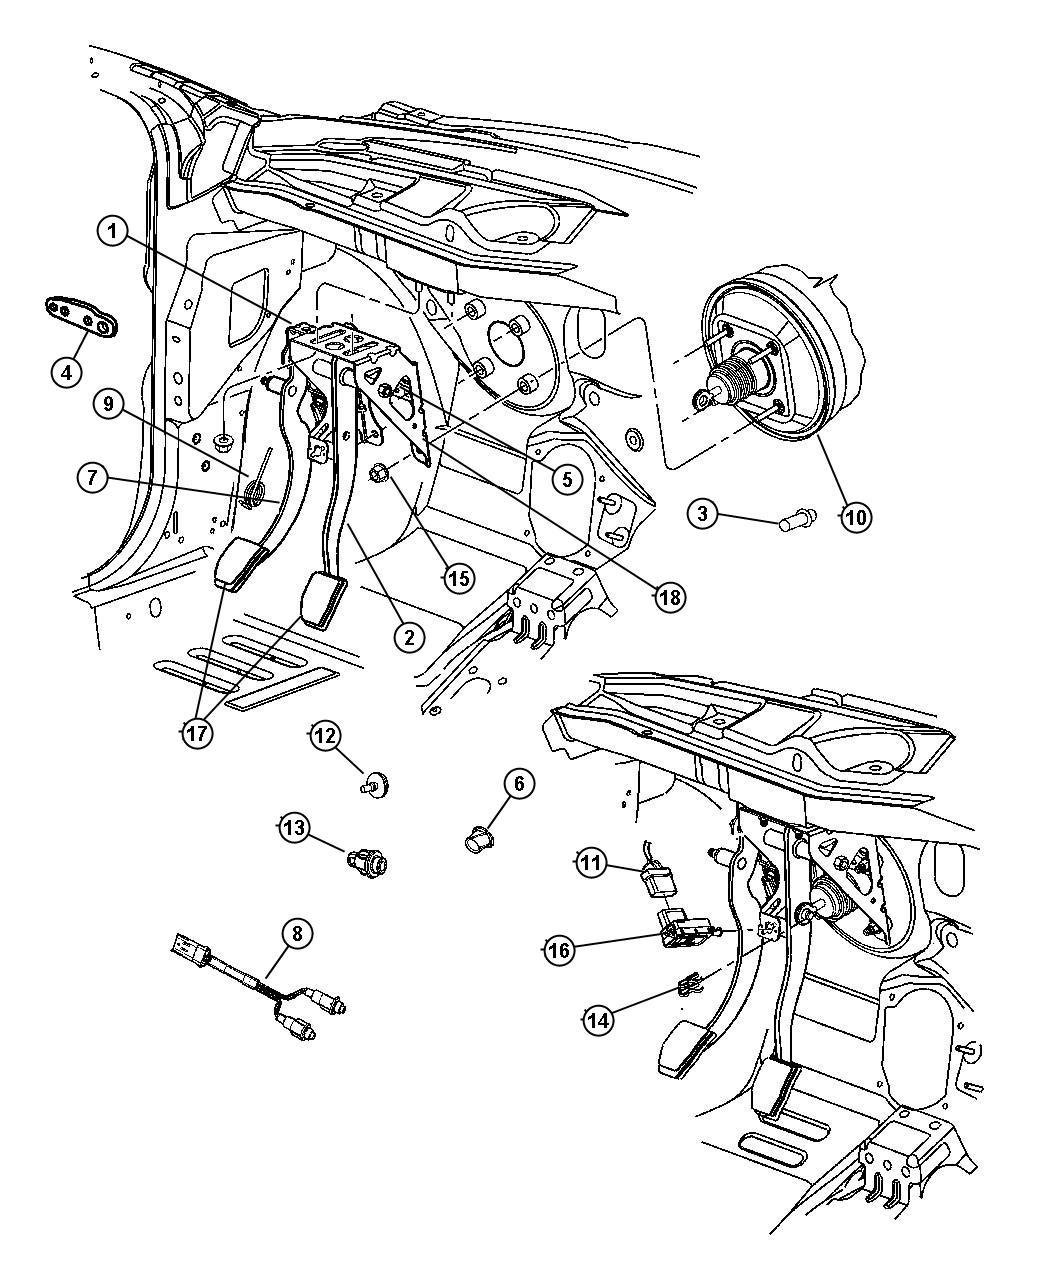 2006 Chrysler Pt Cruiser Clutch Pedal.